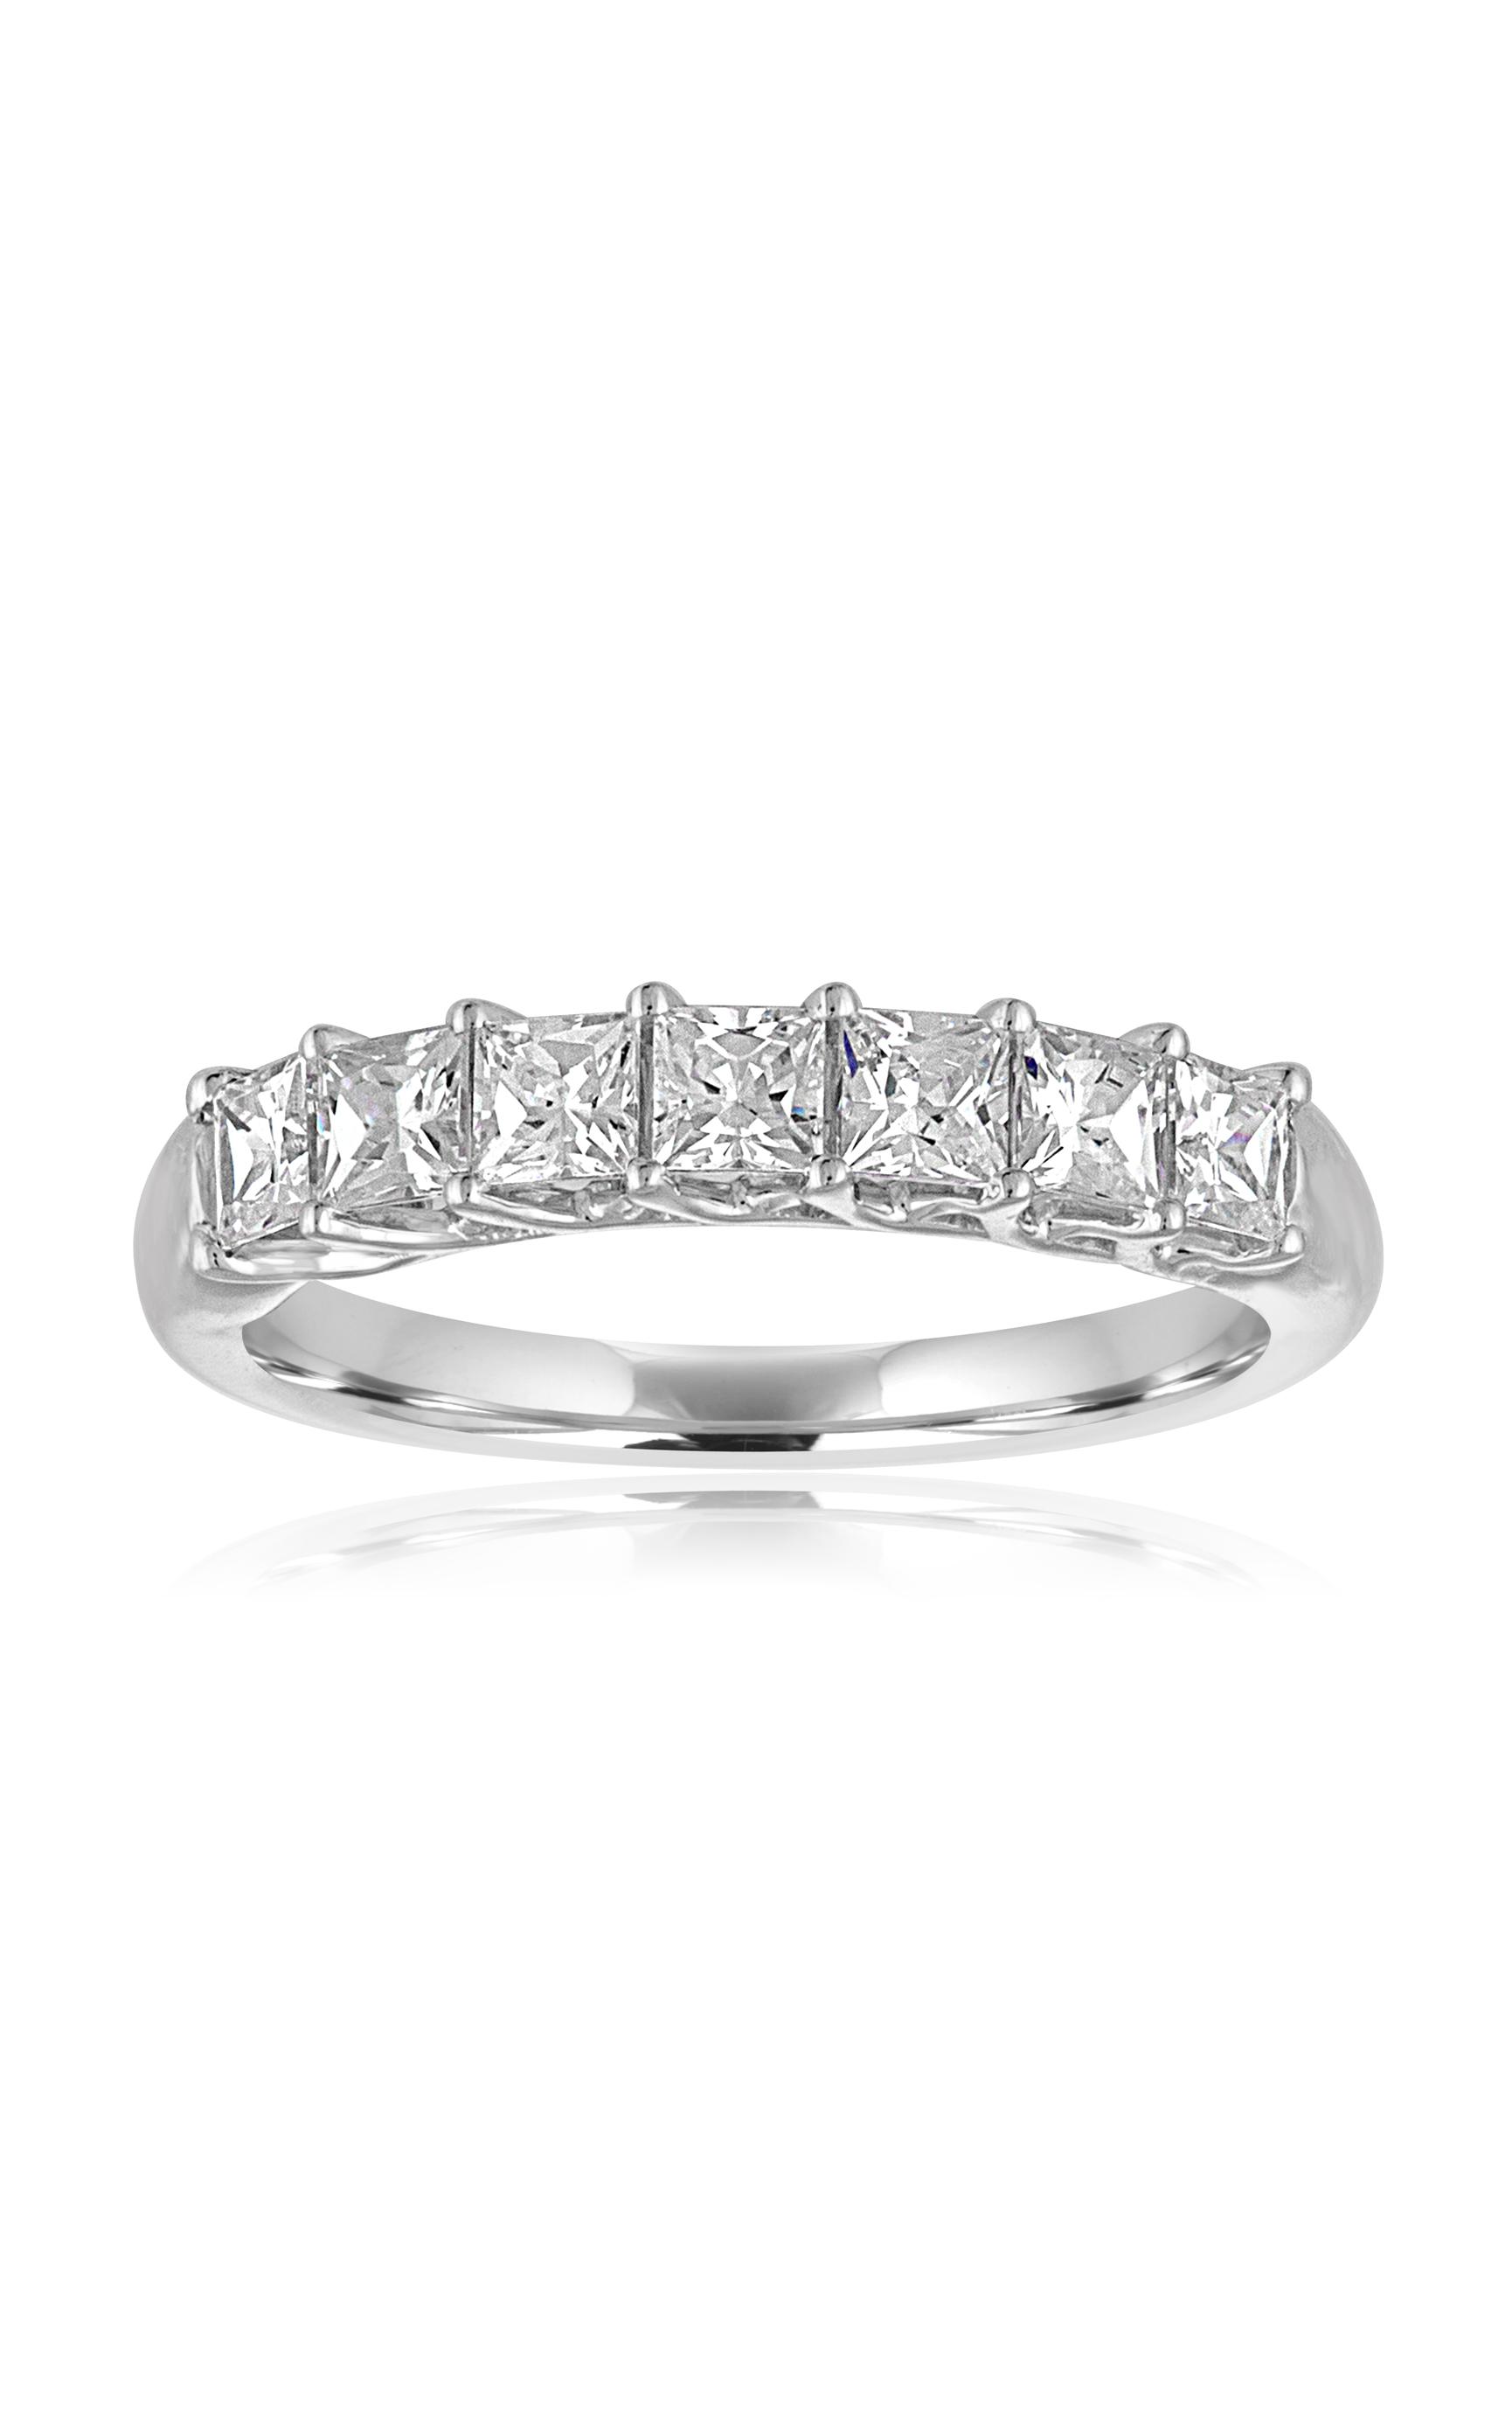 Imagine Bridal Fashion Rings 74076D-1 product image